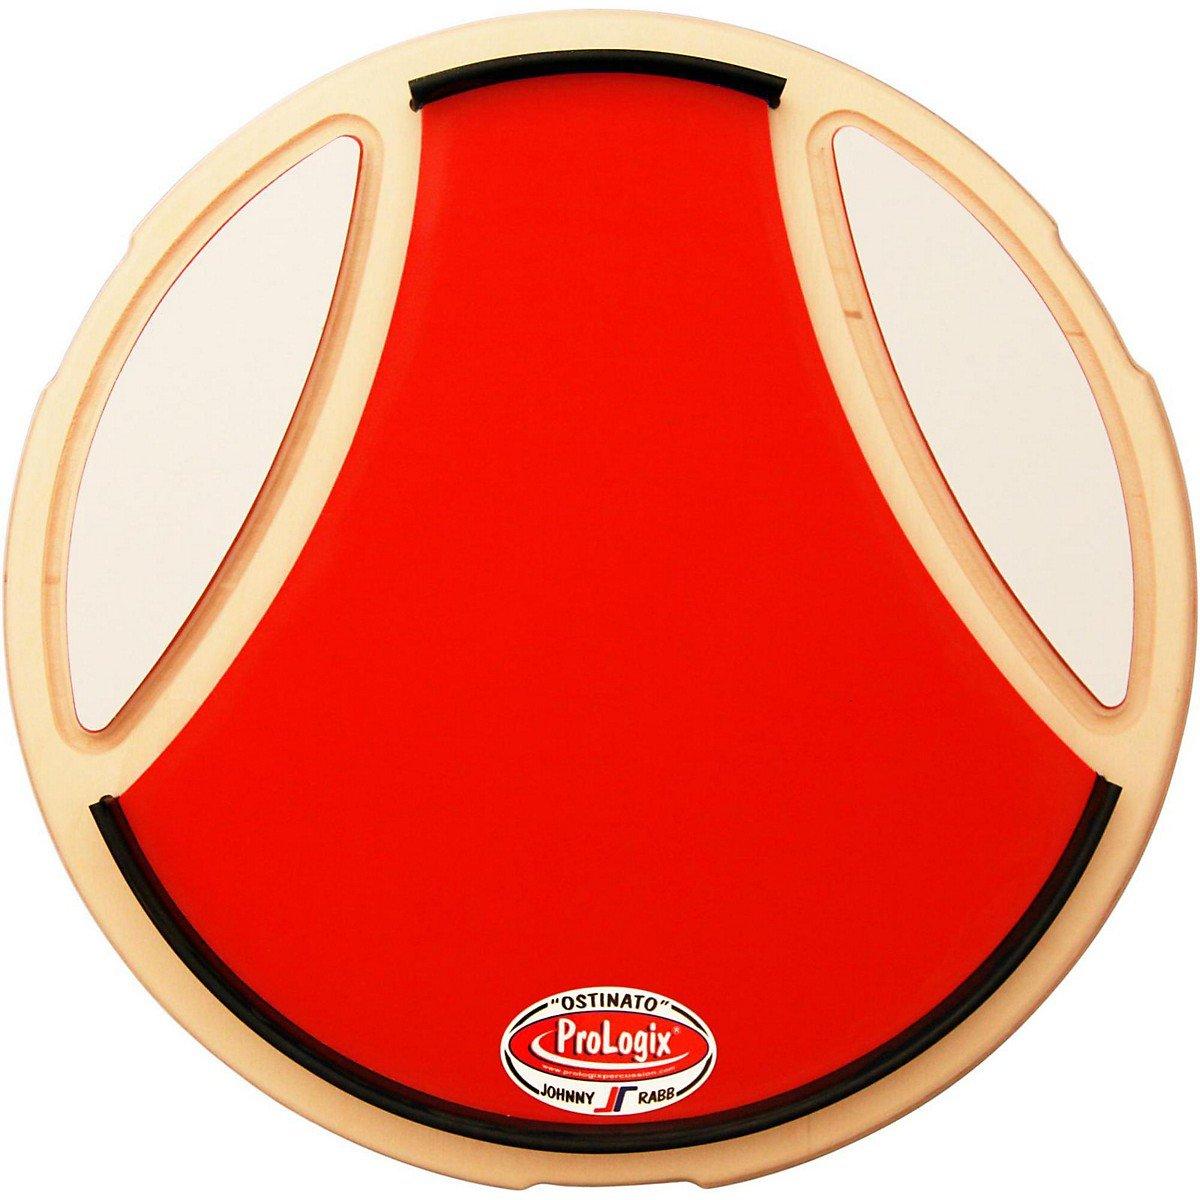 Prologix Percussion Johnny Rabb Signature Ostinato Practice Pad - 12''